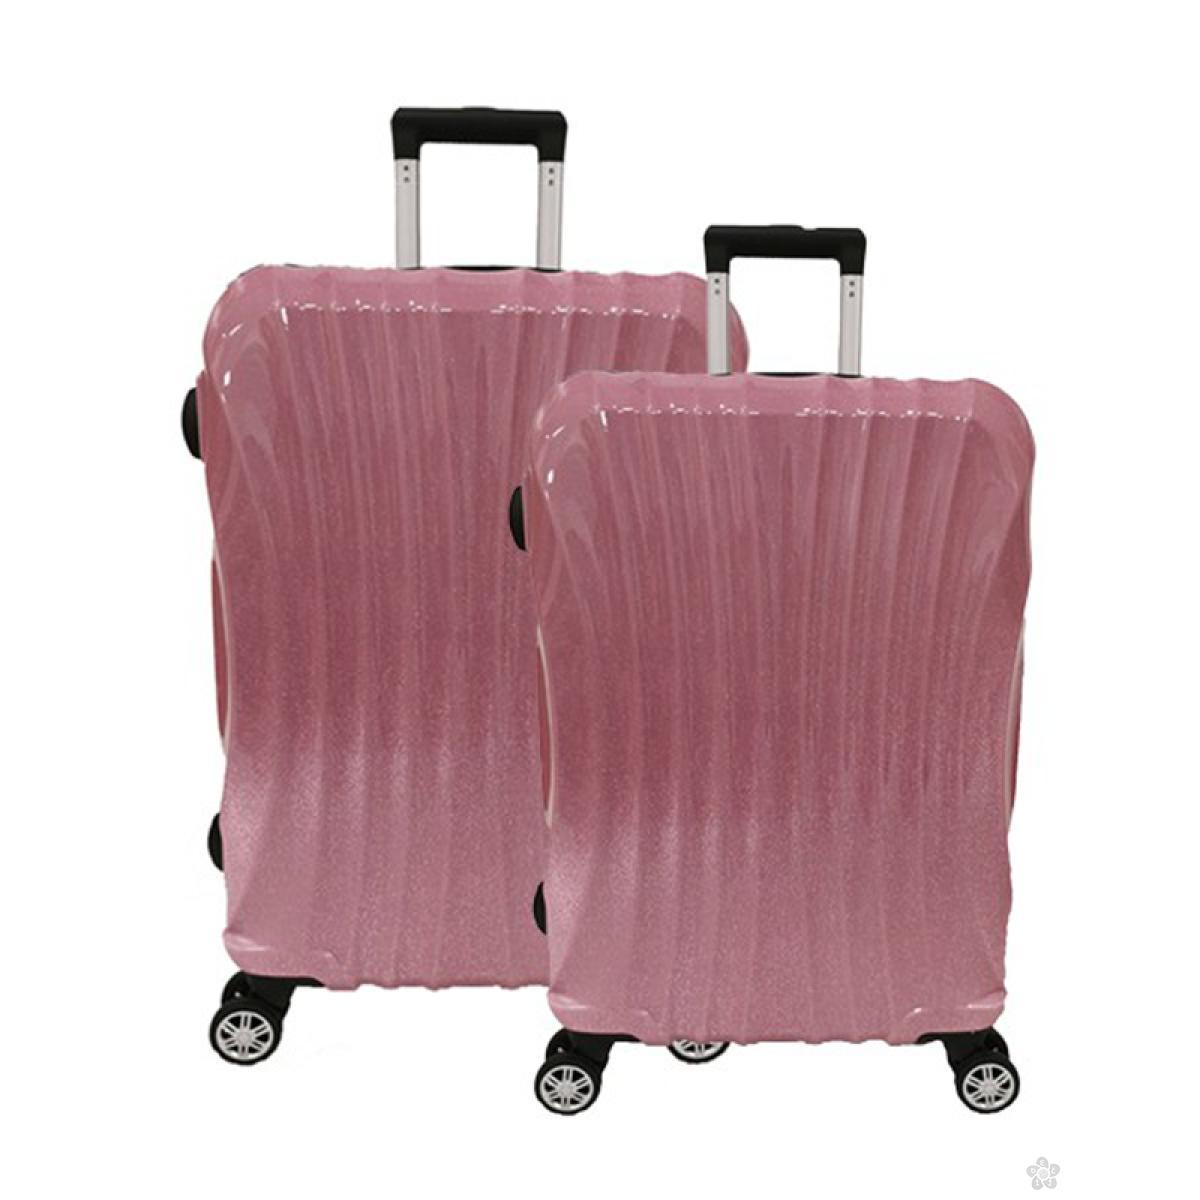 Set kofera Las Vegas ABS 2 komada -gliter roze